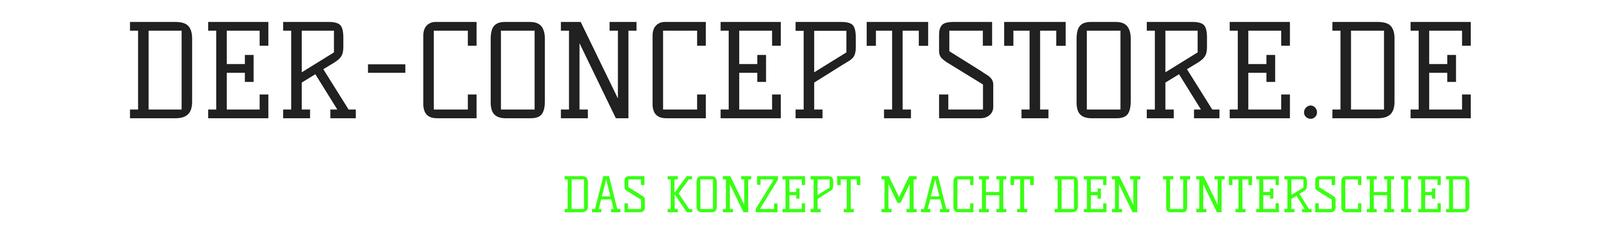 der-conceptstore.de